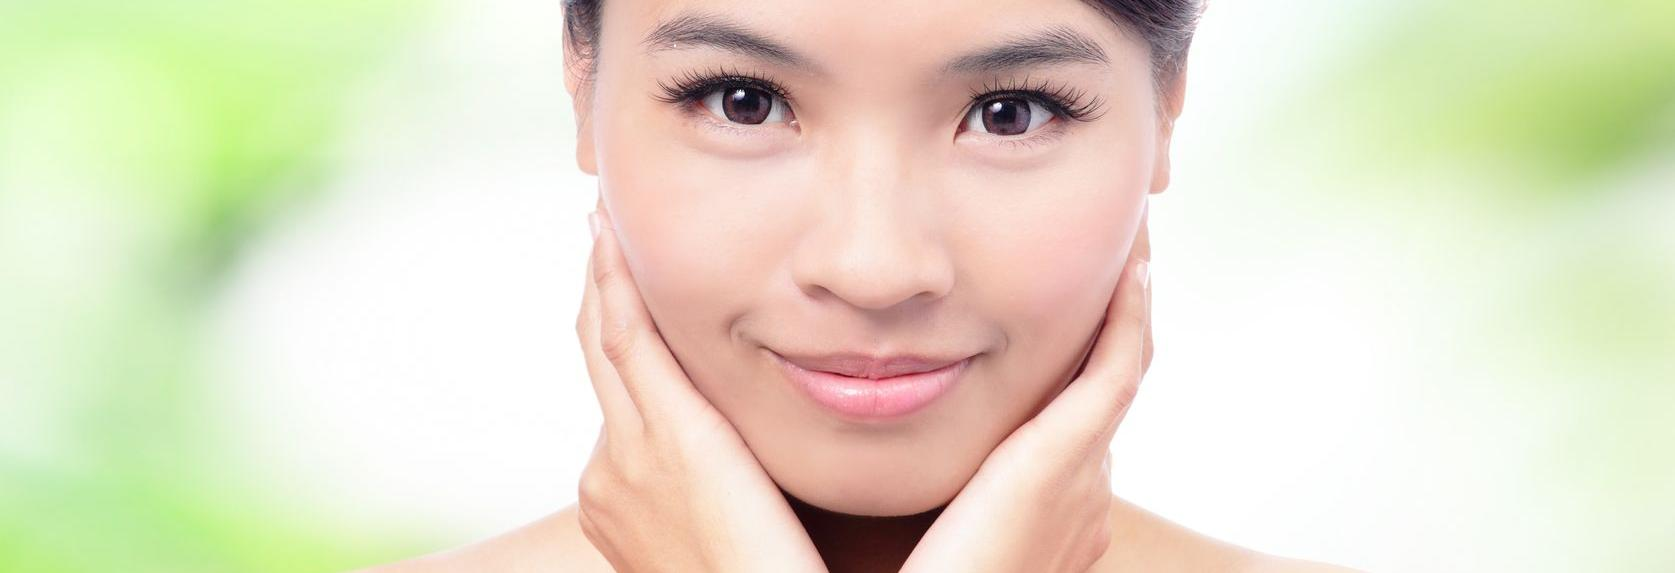 plasma therapy, face therapy, hair therapy, dark spot correction, plasma facial